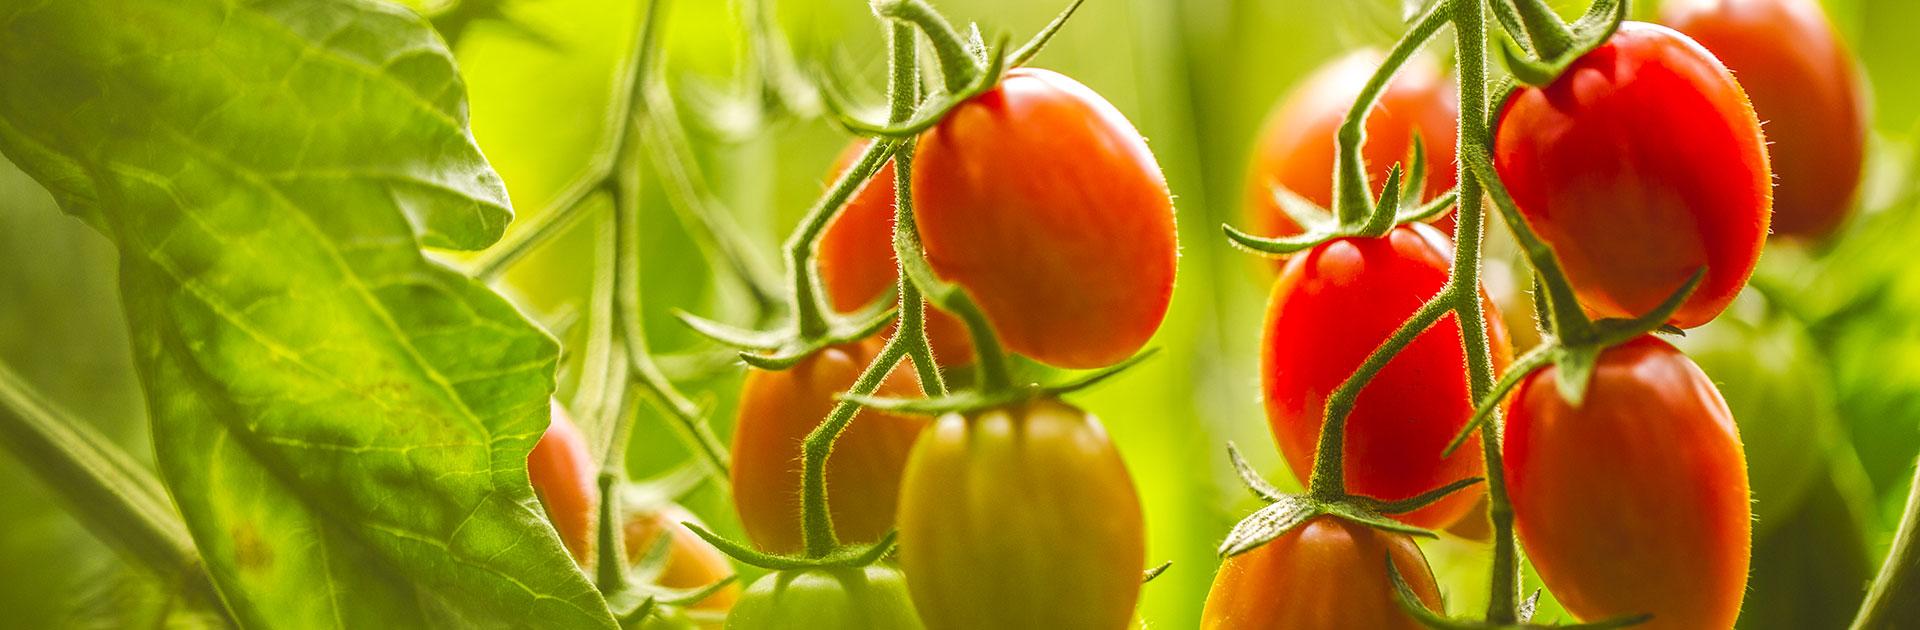 tomate-zero-residus-de-pesticides-azura